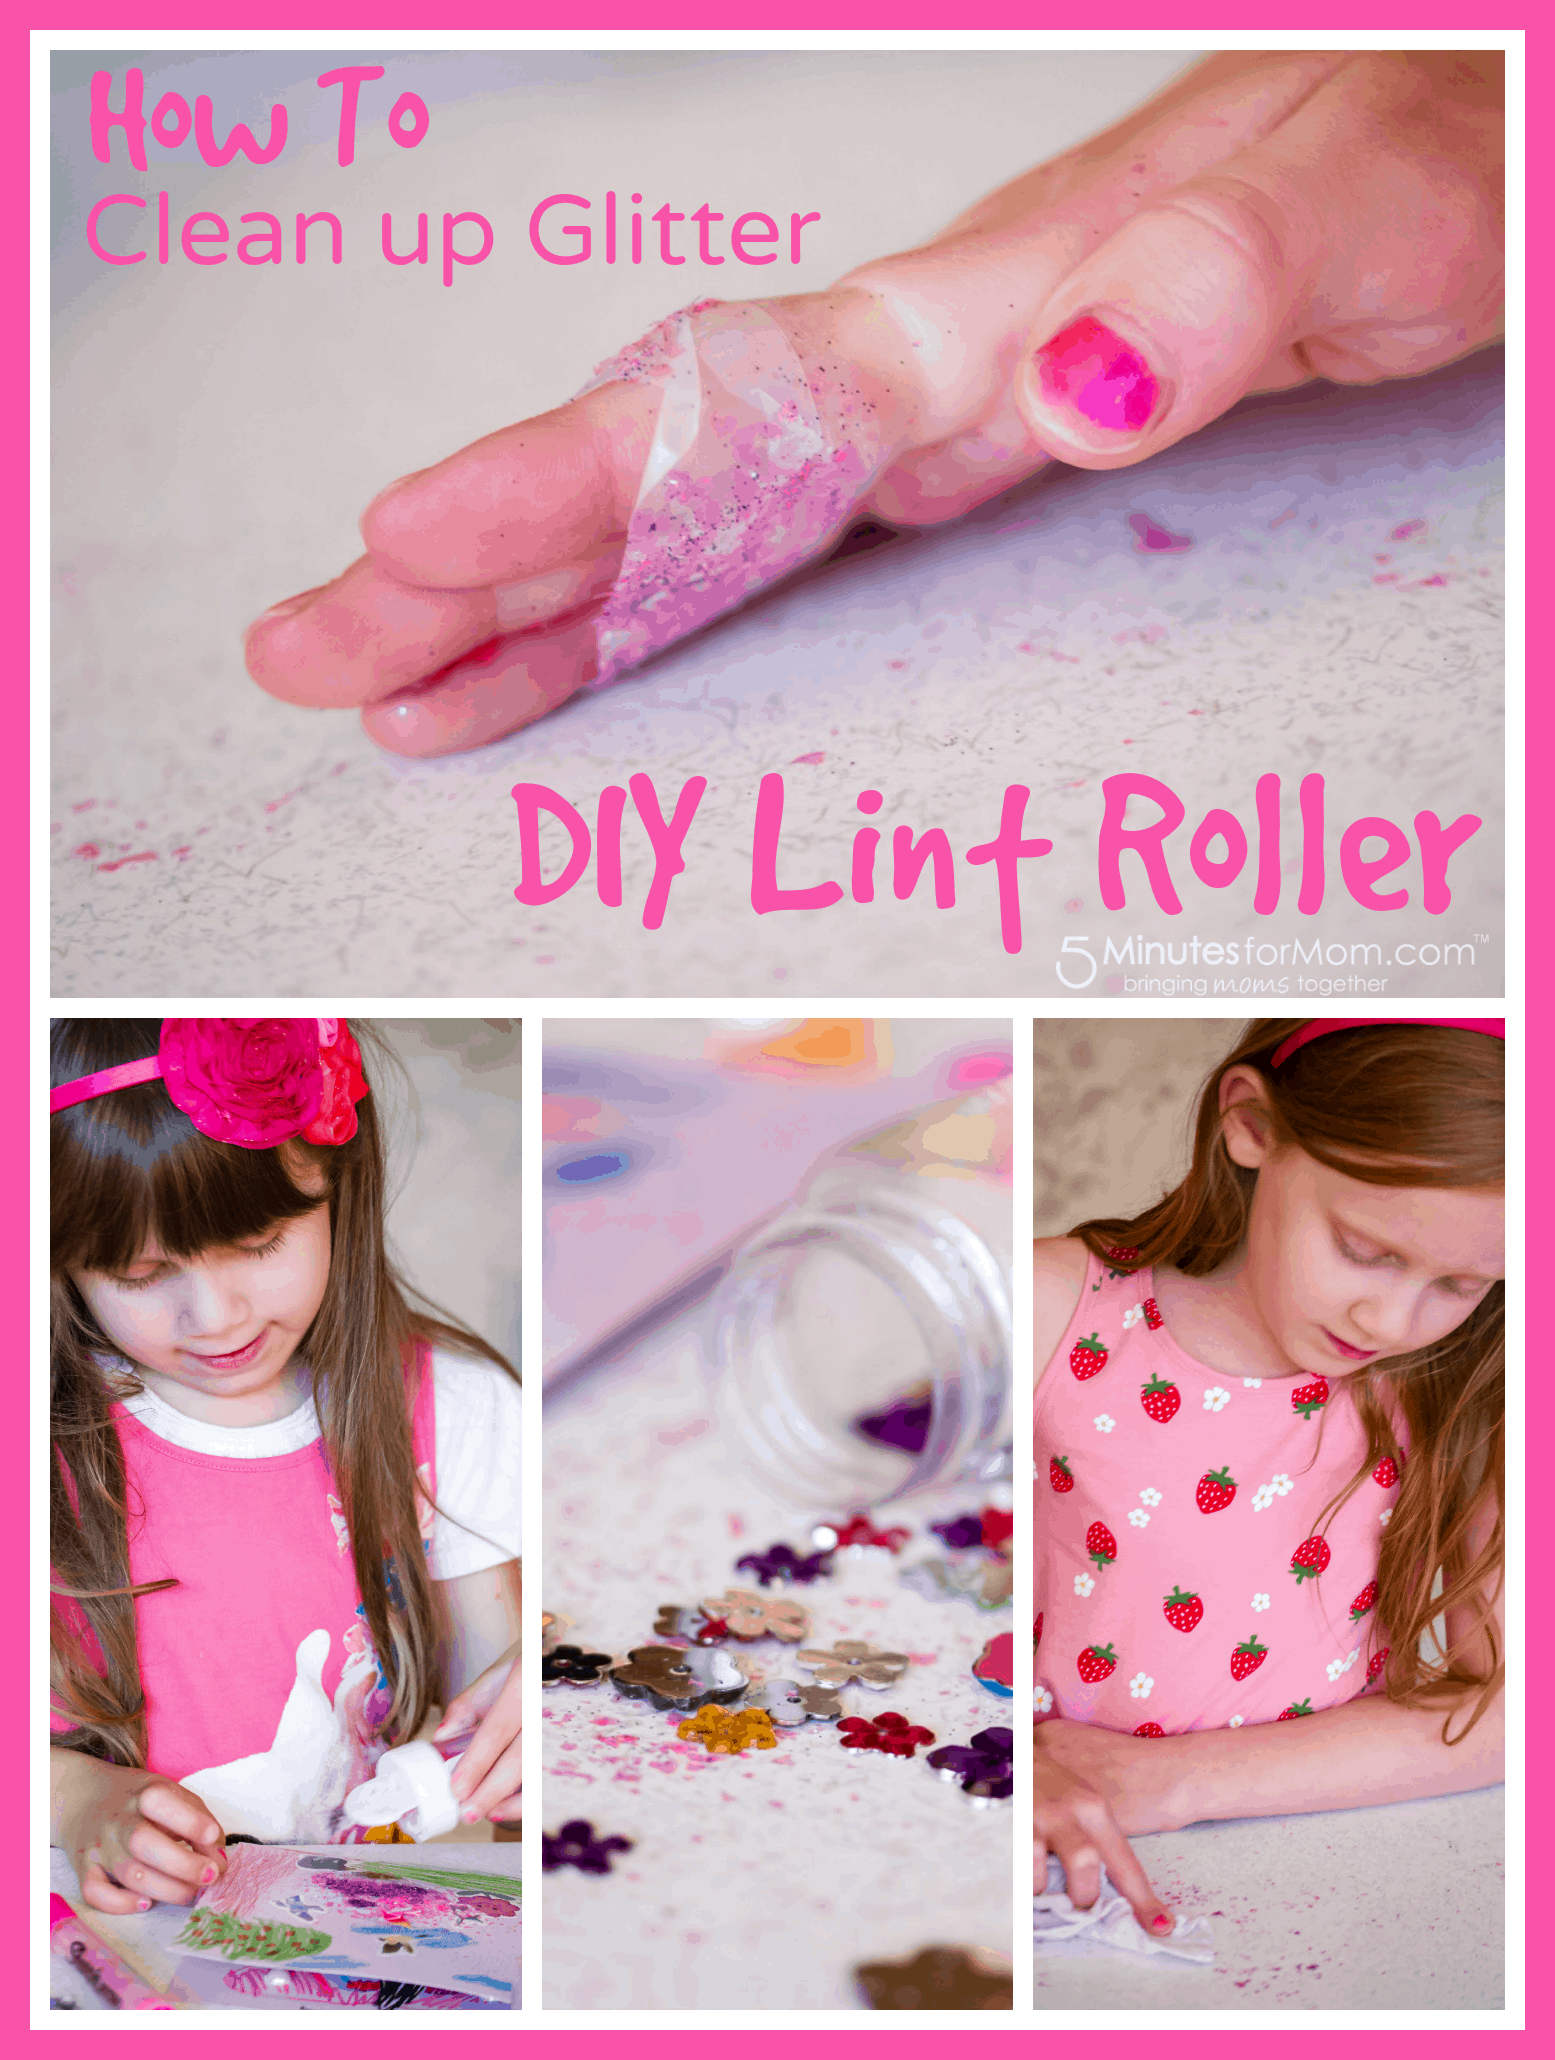 DIY Lint Roller